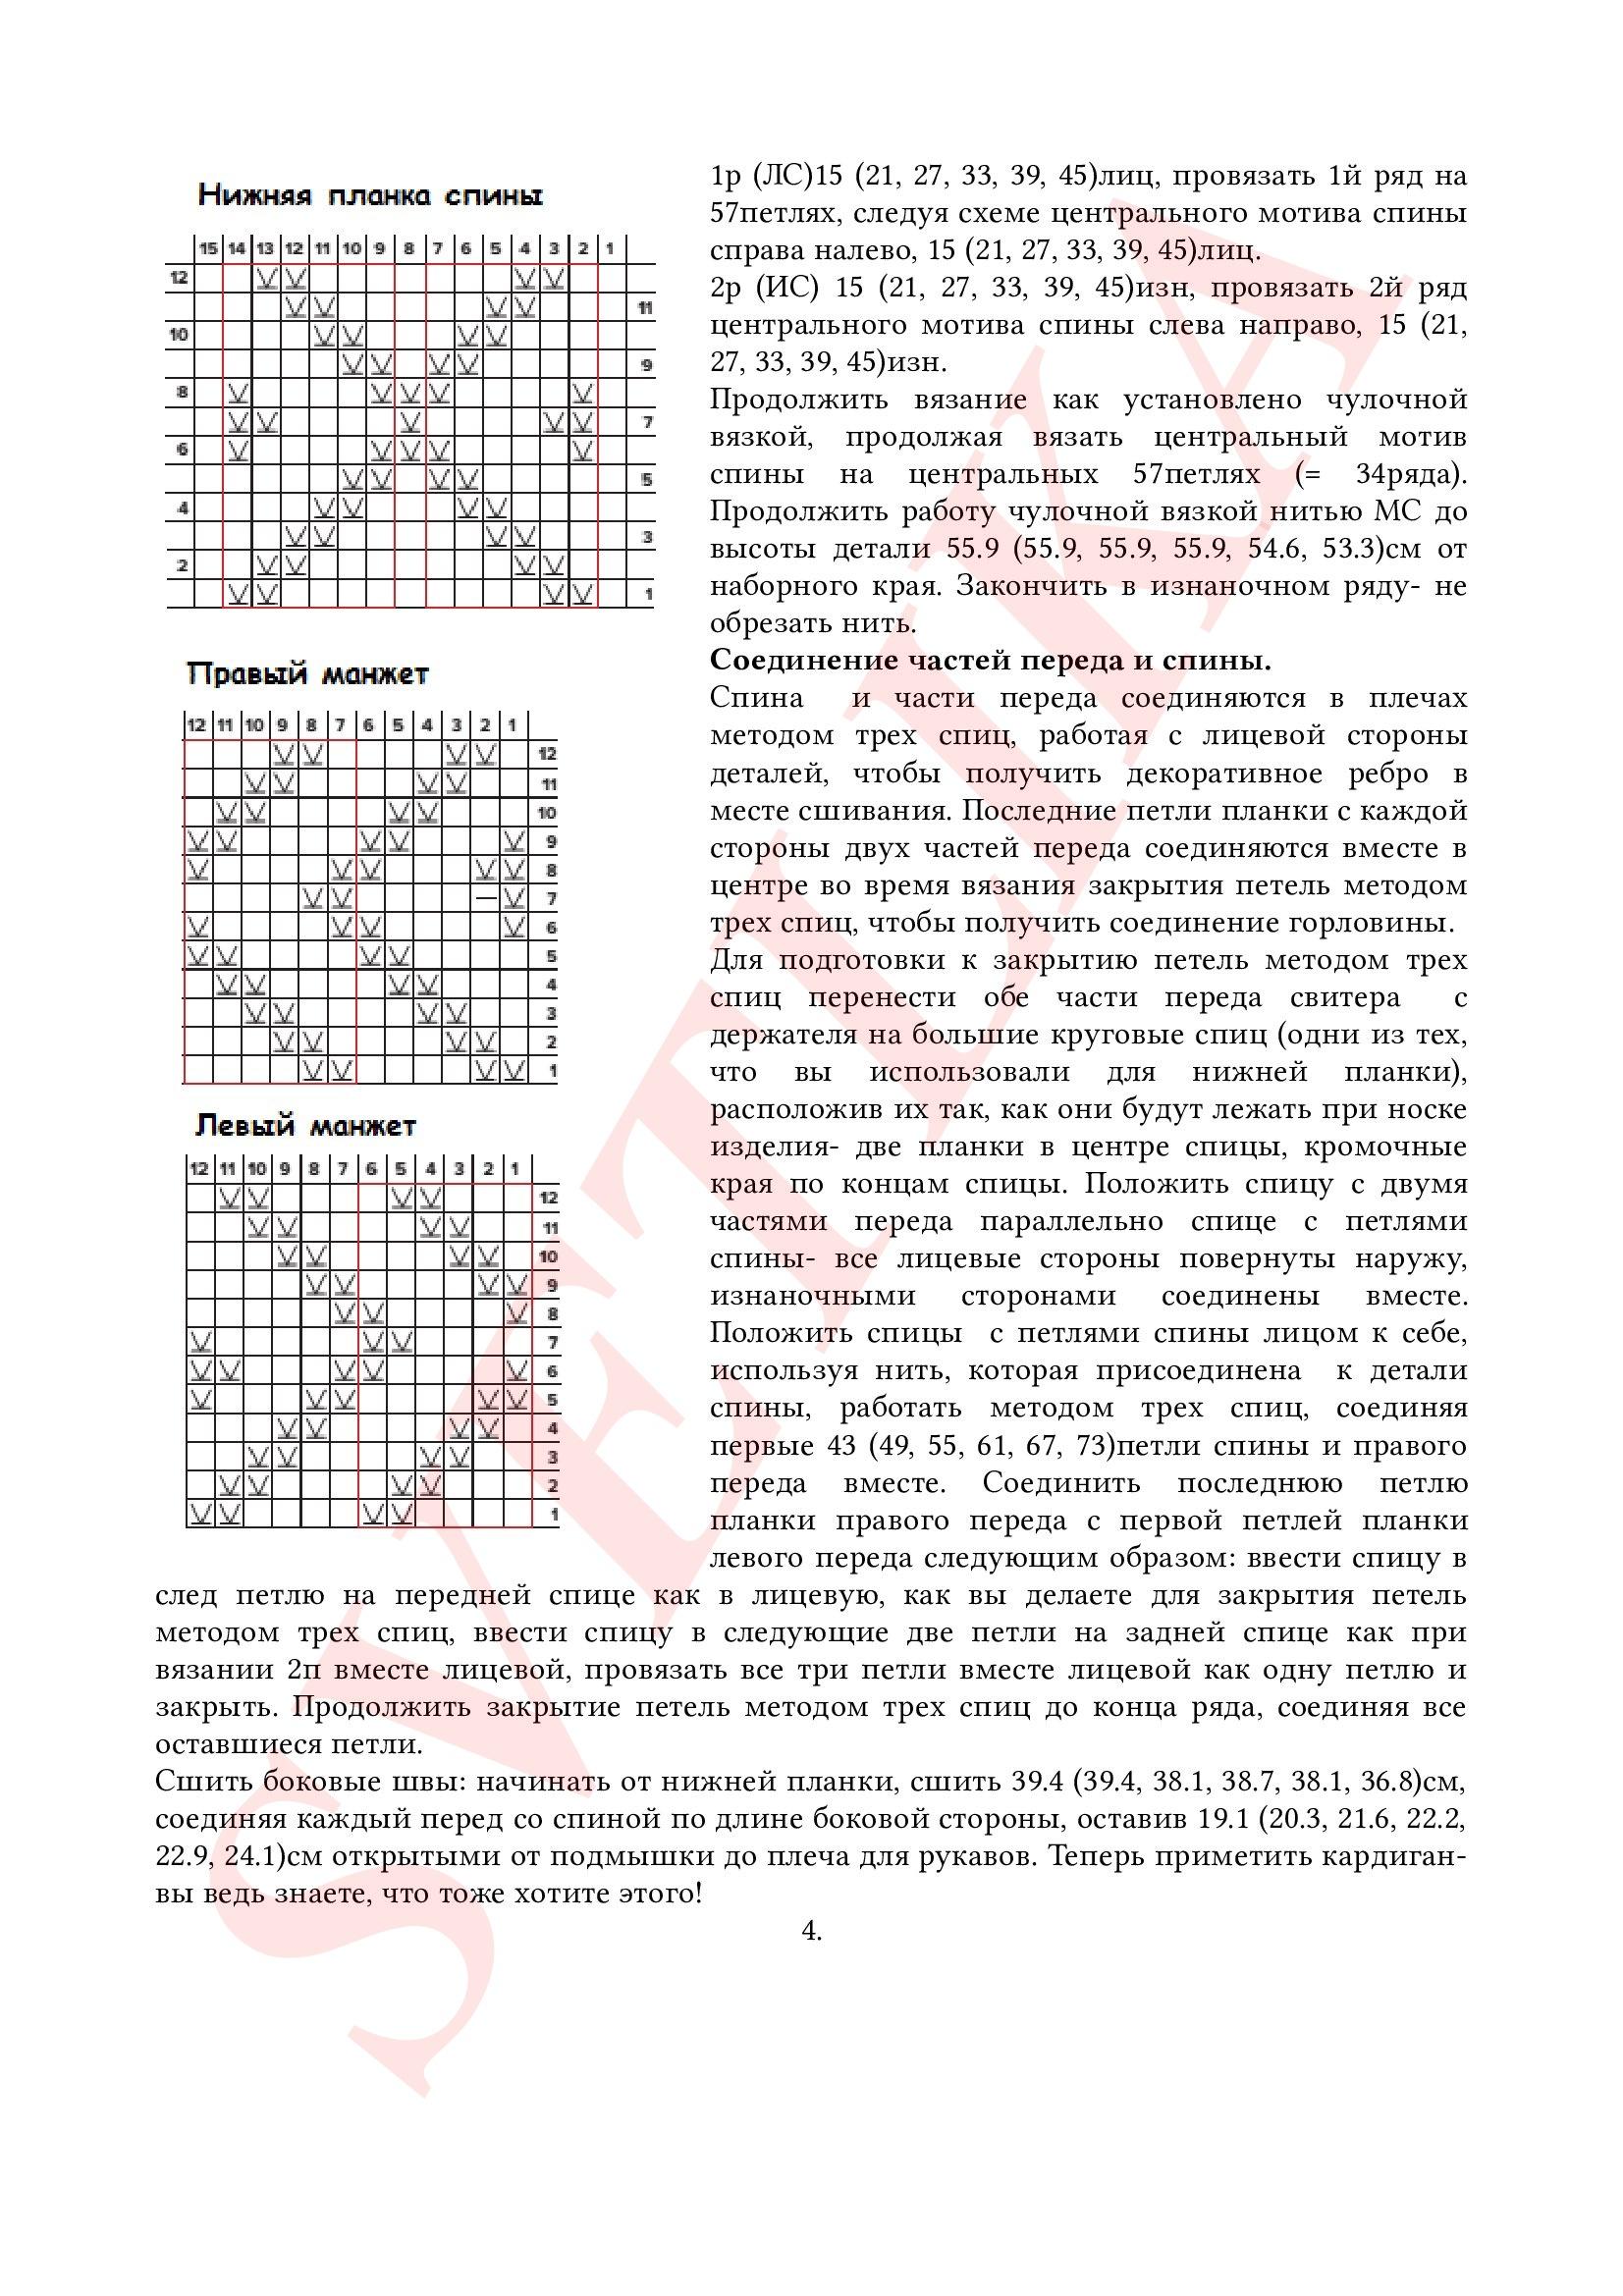 https://img-fotki.yandex.ru/get/246155/125862467.aa/0_1bcb3e_91d2a835_orig